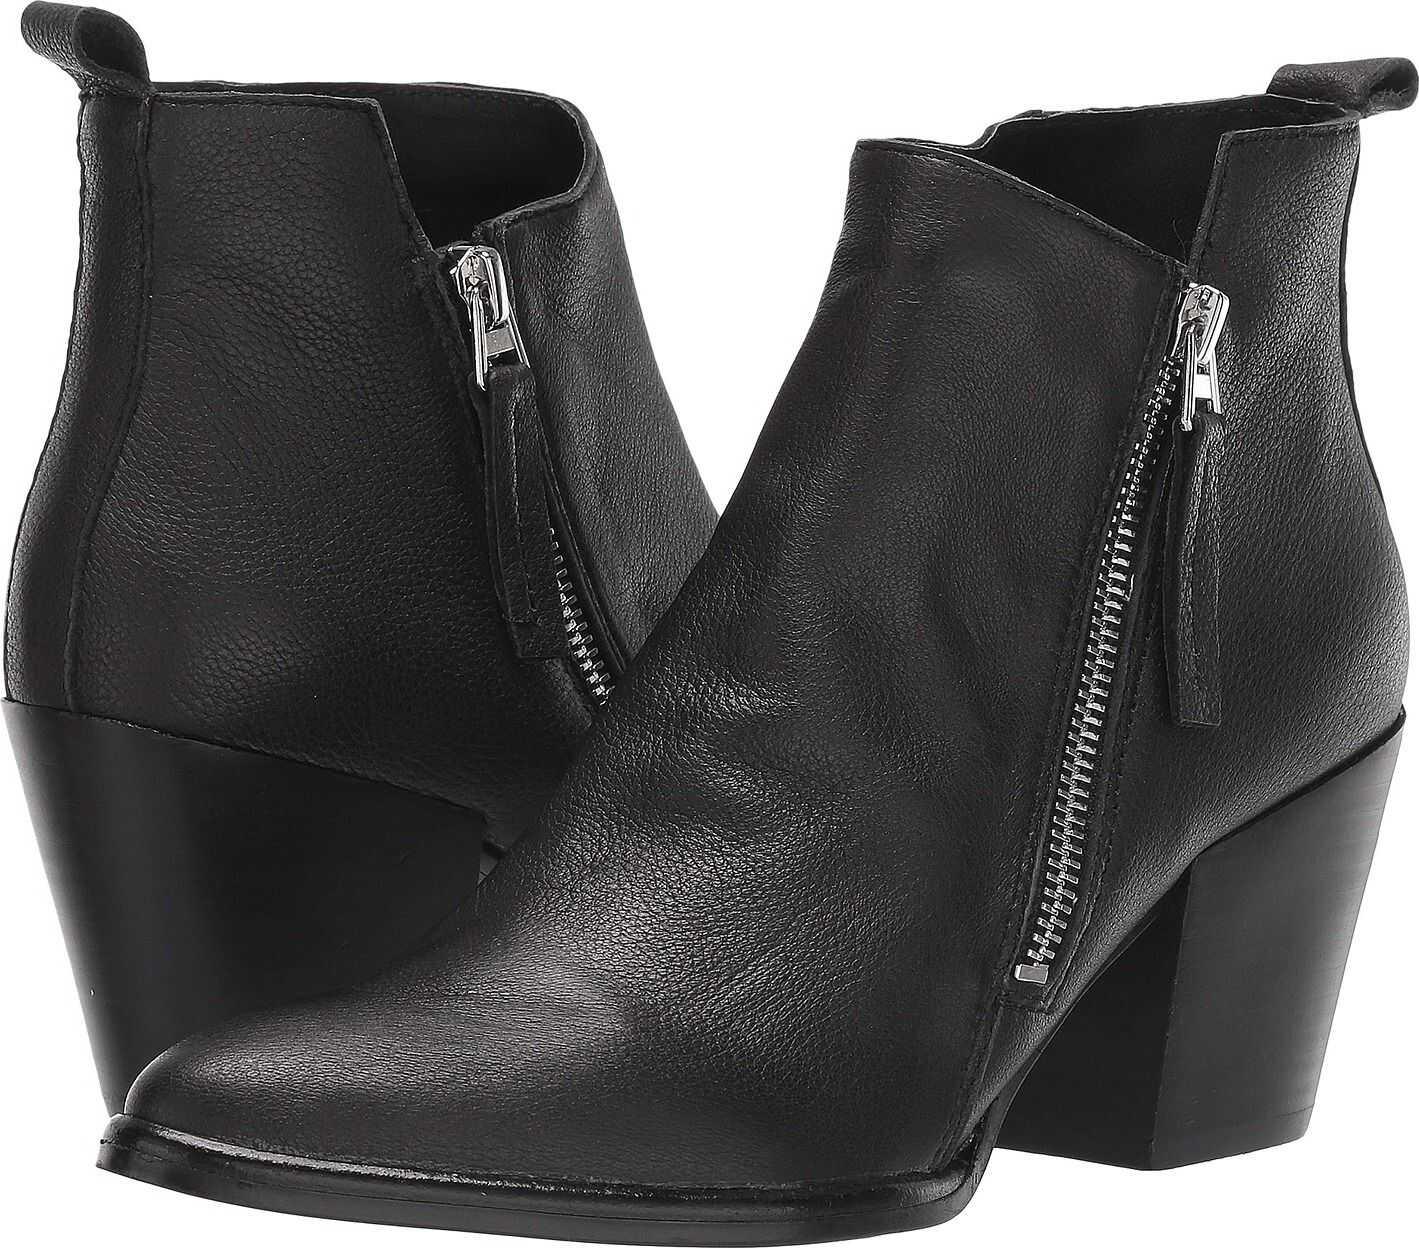 Dolce Vita Rakel Black Leather